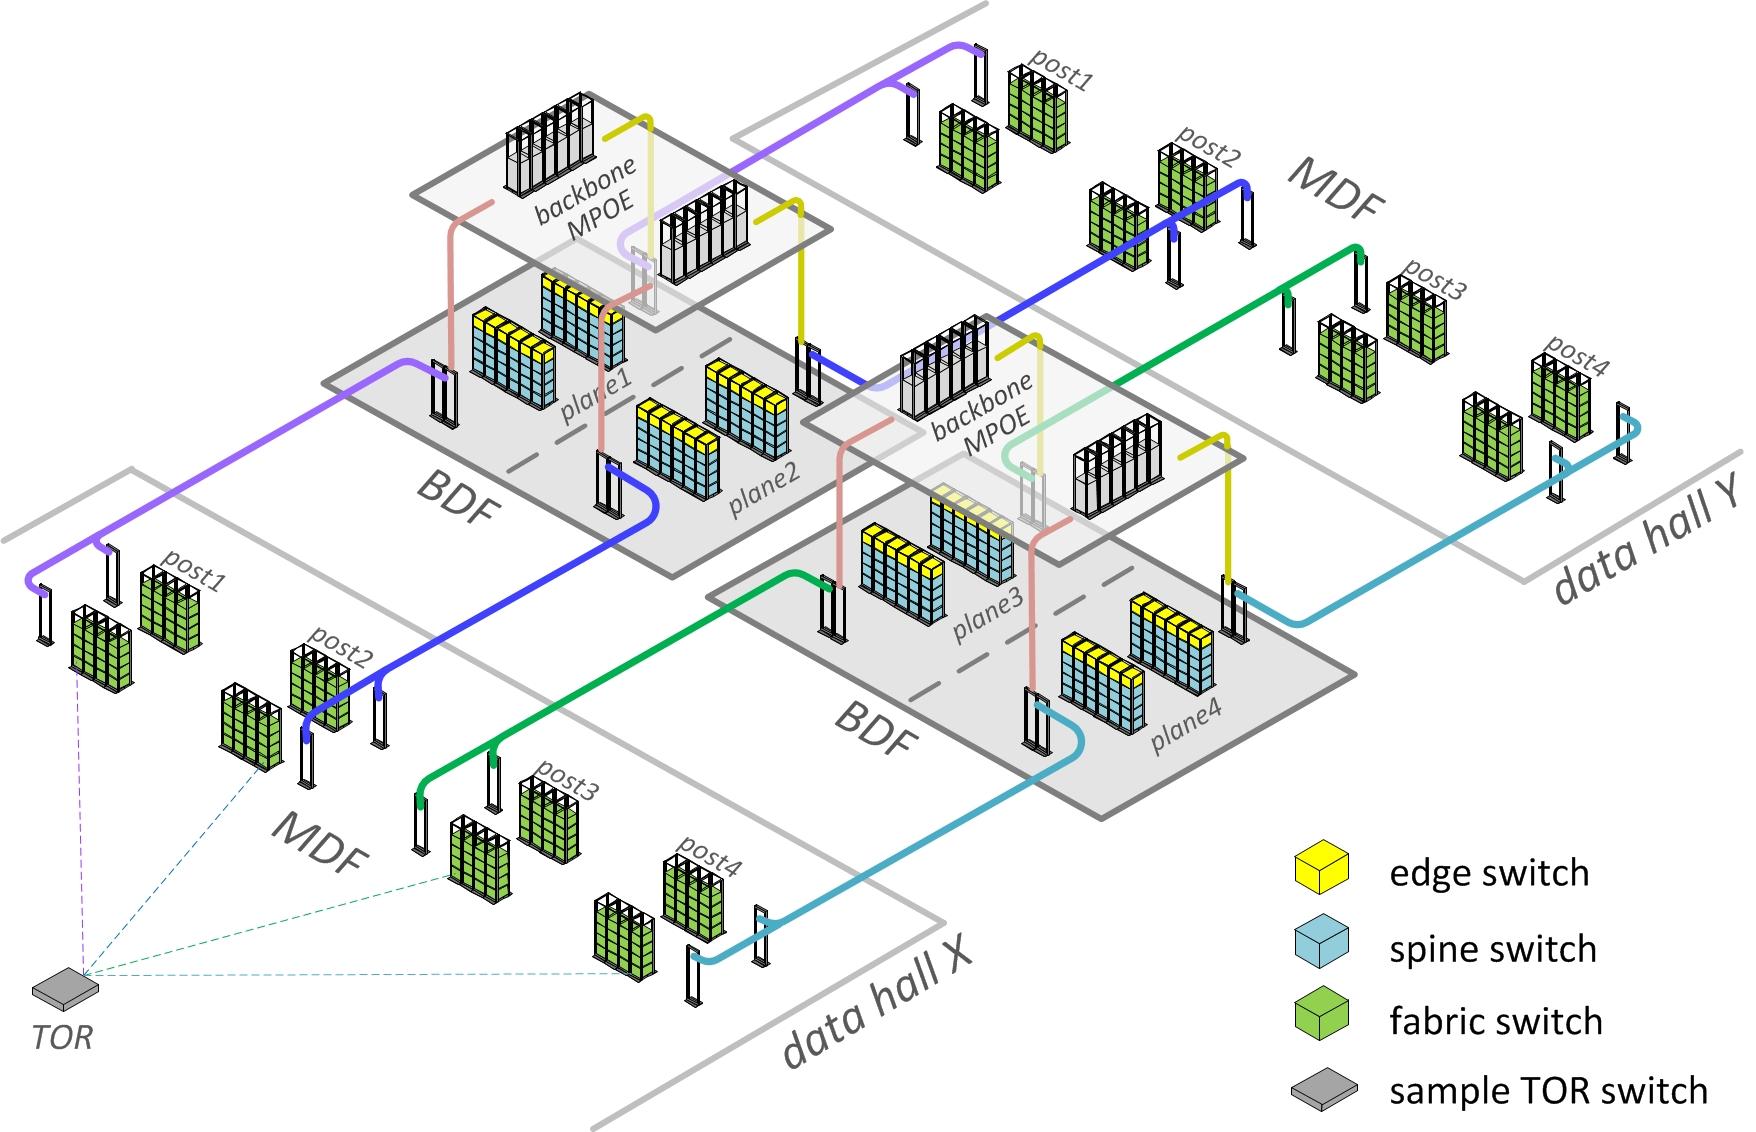 Nexus Smart Switch Wiring Introducing Data Center Fabric The Next Generation